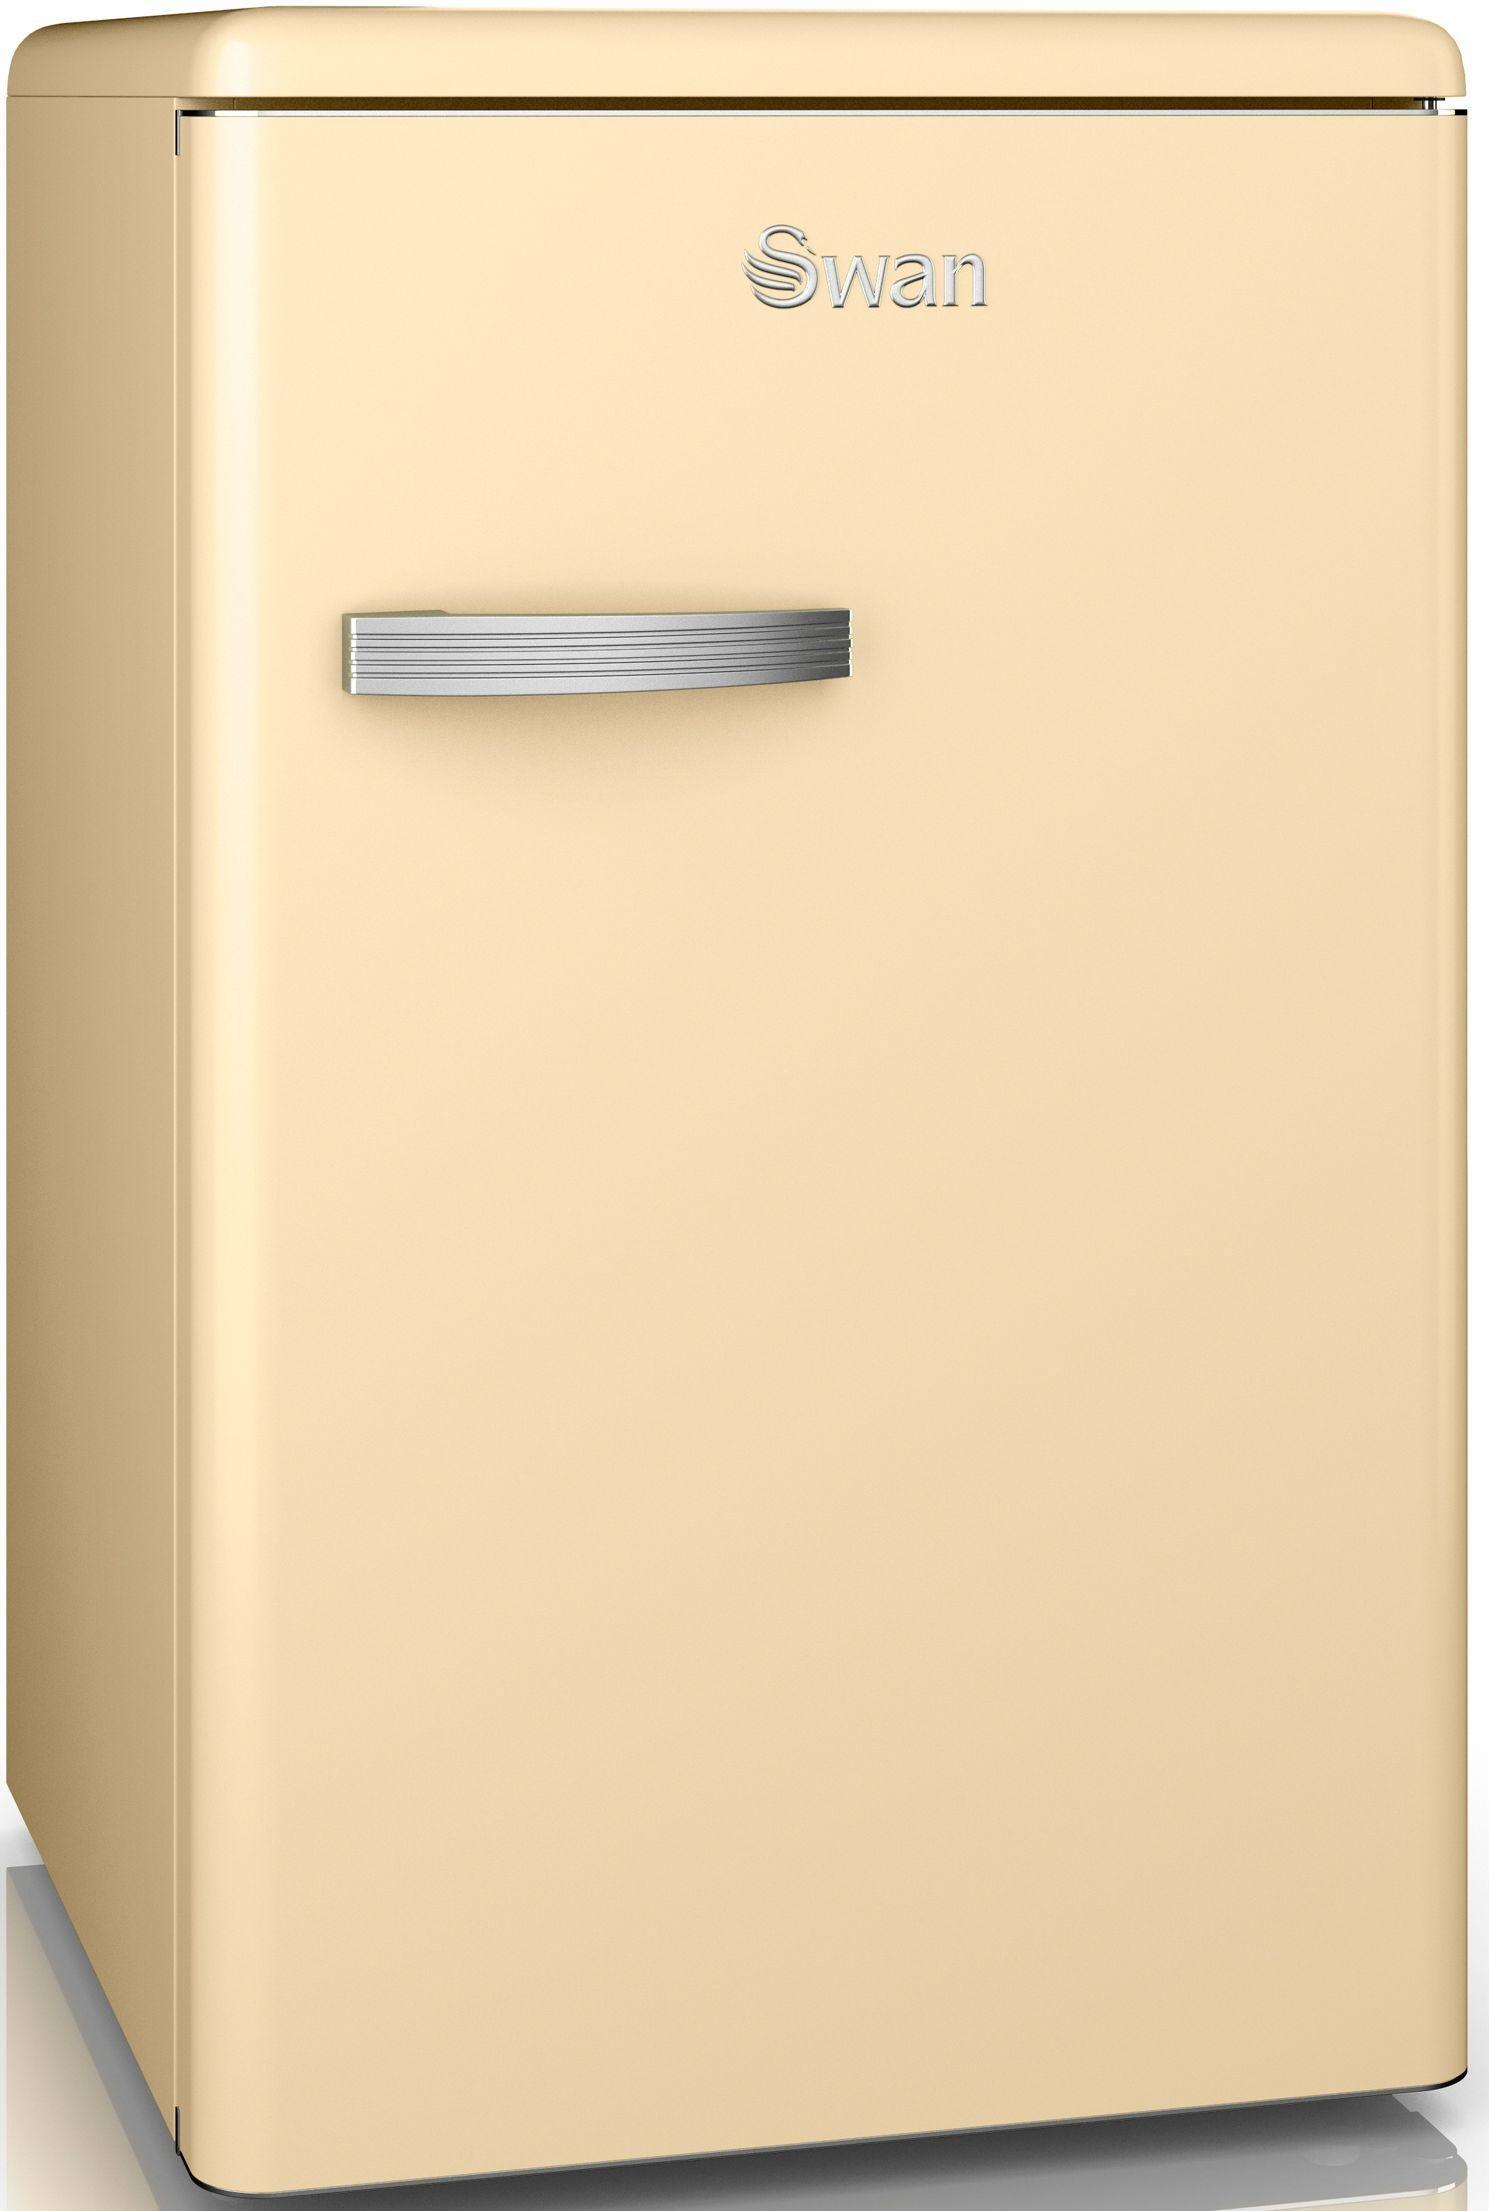 swan-sr1103cn-retro-larder-fridge-cream